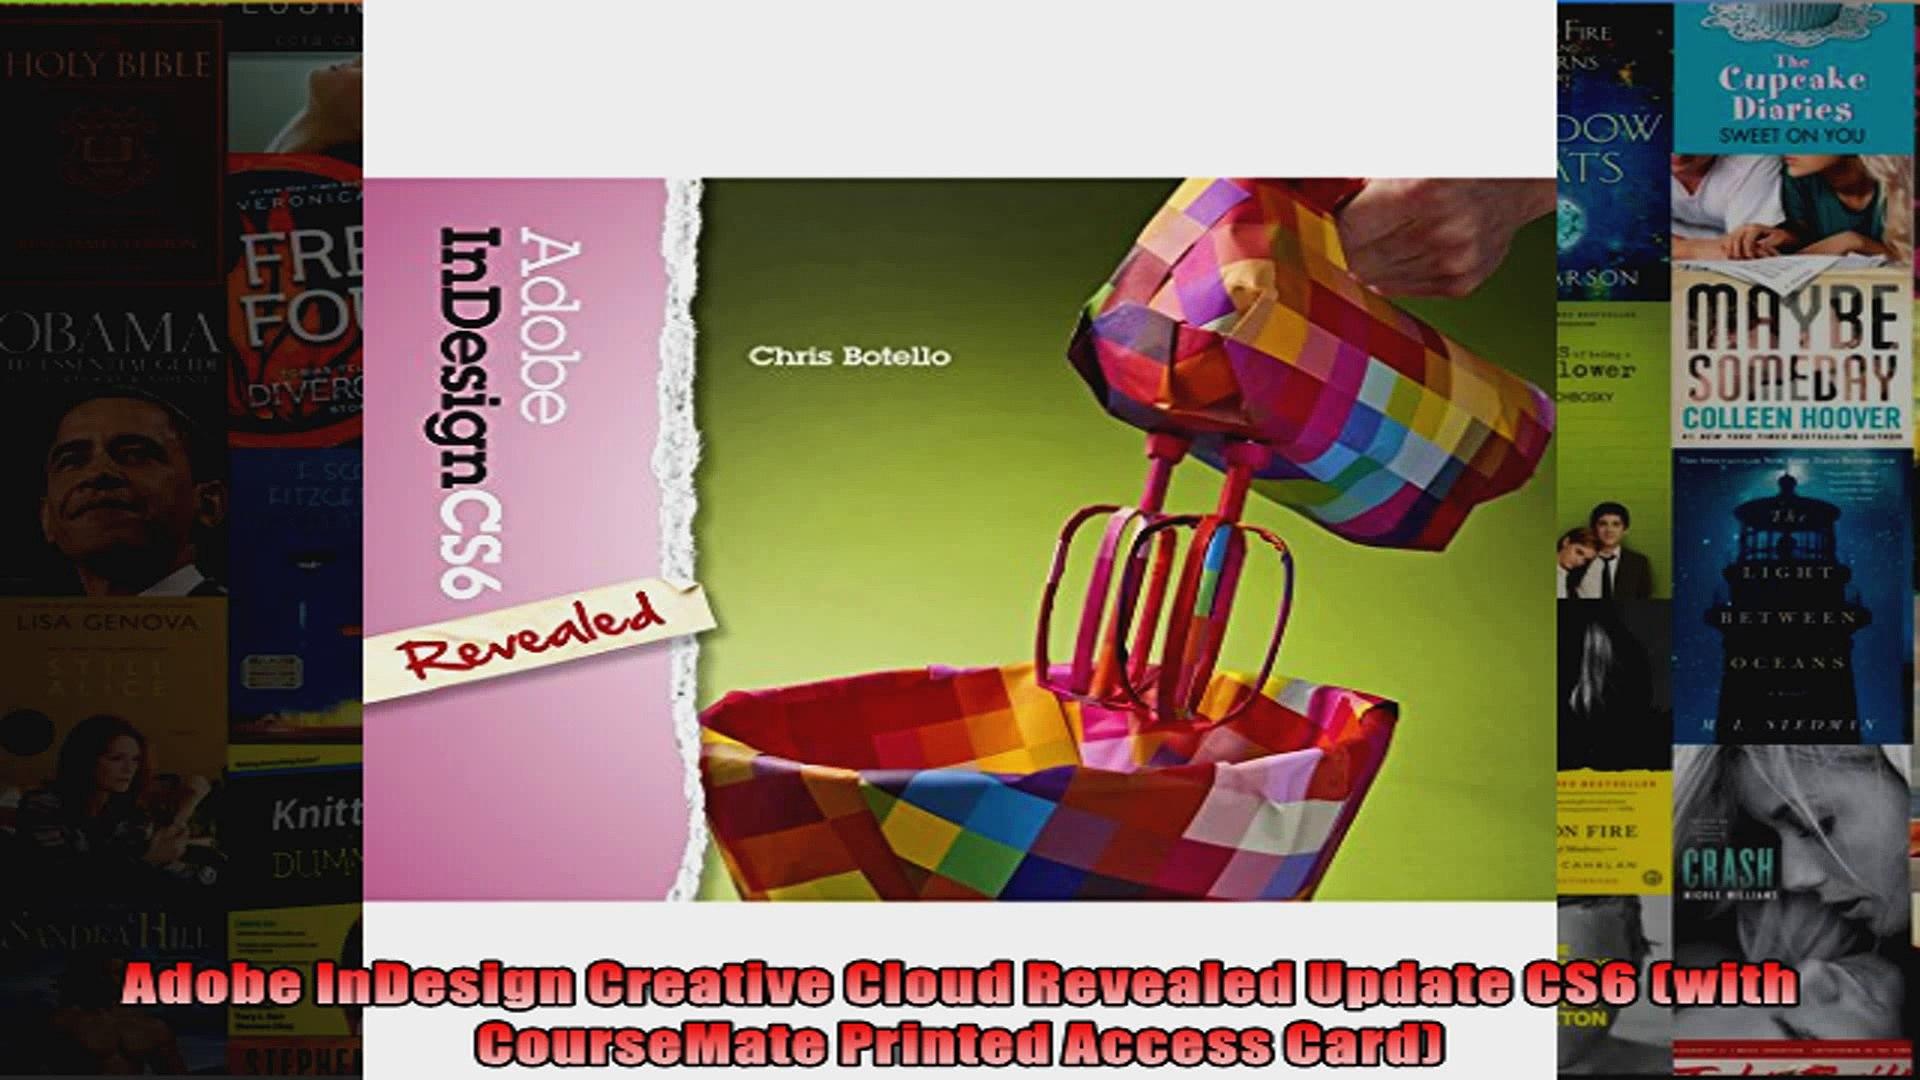 Adobe/® InDesign Creative Cloud Revealed